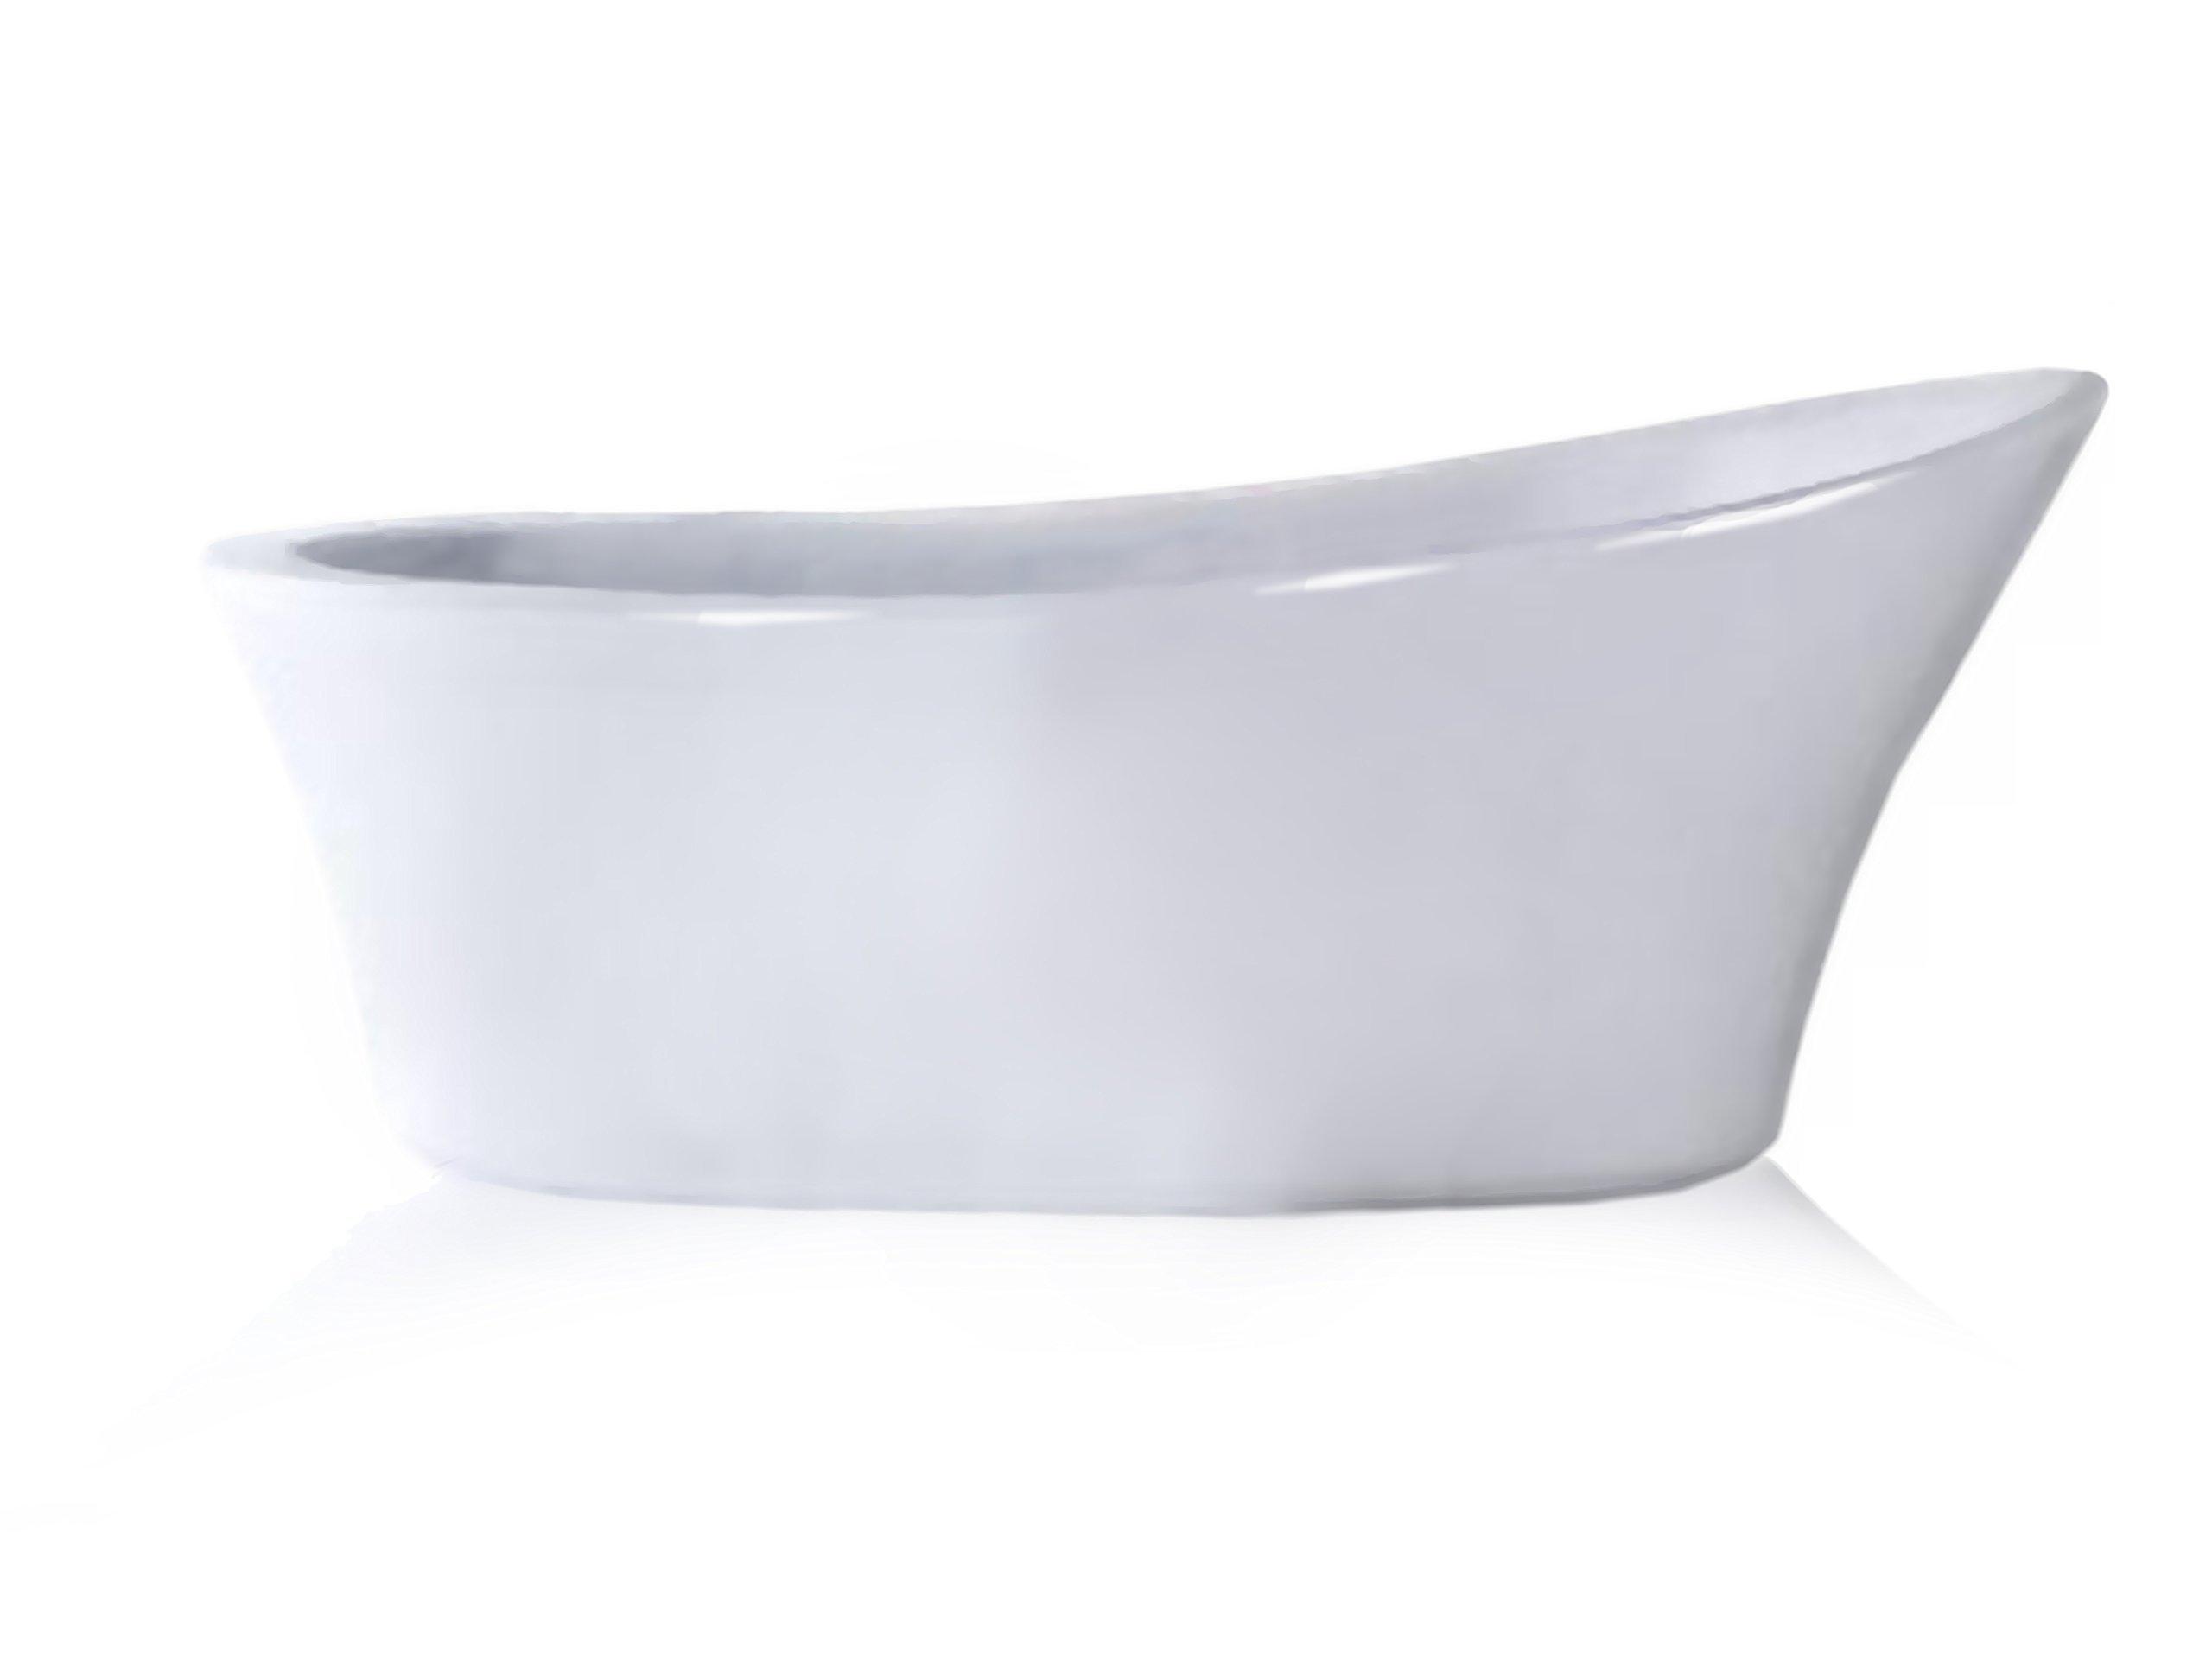 Modetti MIAMI6638G Freestanding Acrylic Bathtub, 65'' L, Glossy White